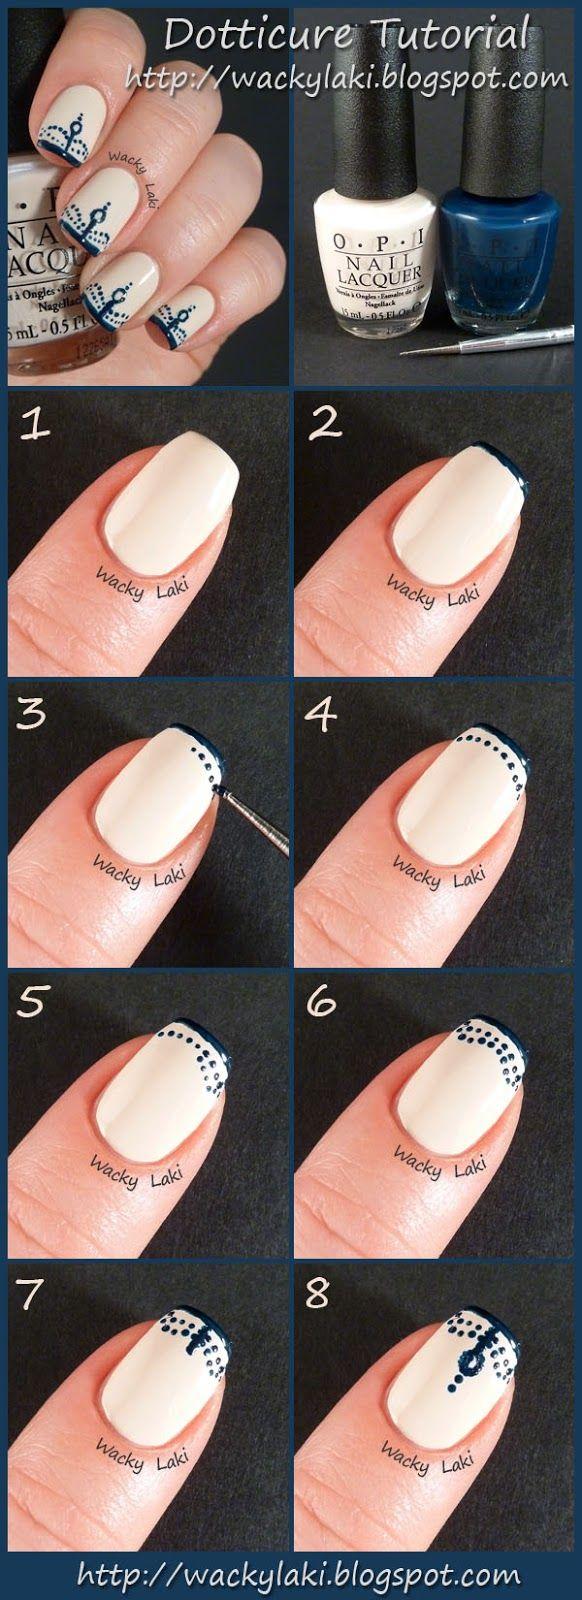 Wacky Laki: Dotticure Tutorial - delicate, feminine dots & funky french tips nail art design